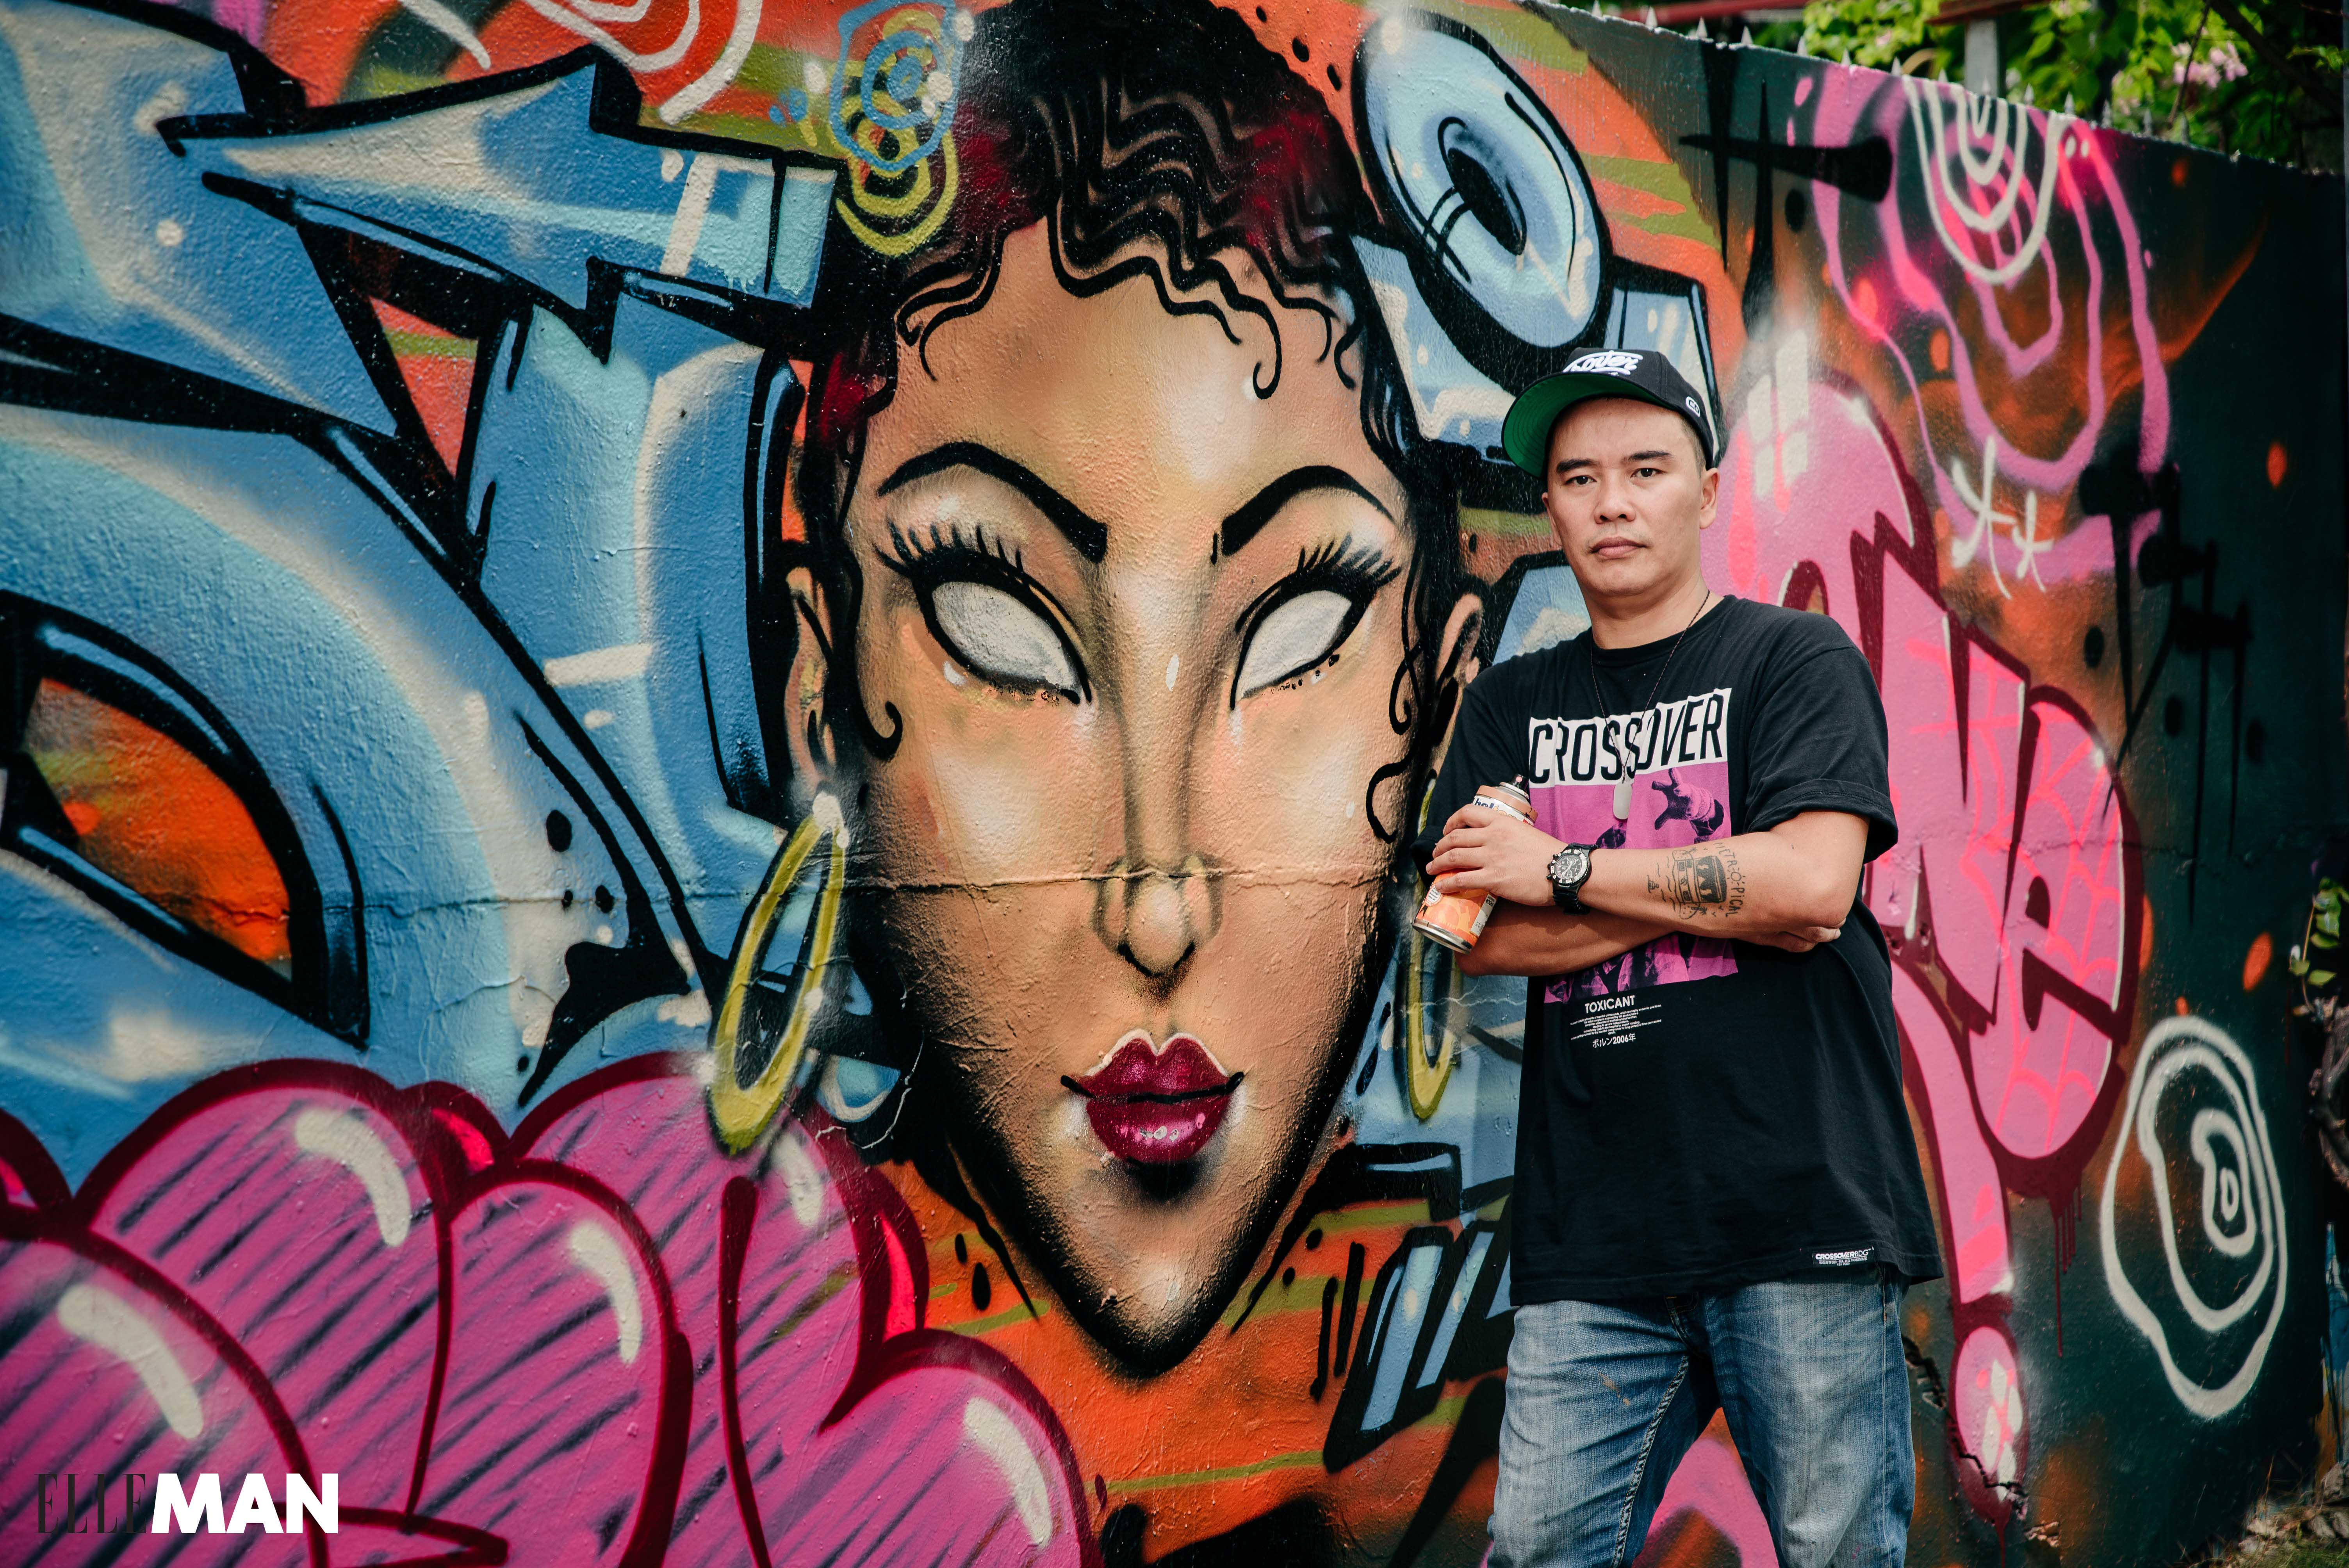 nghe si graffiti Suby - elle man